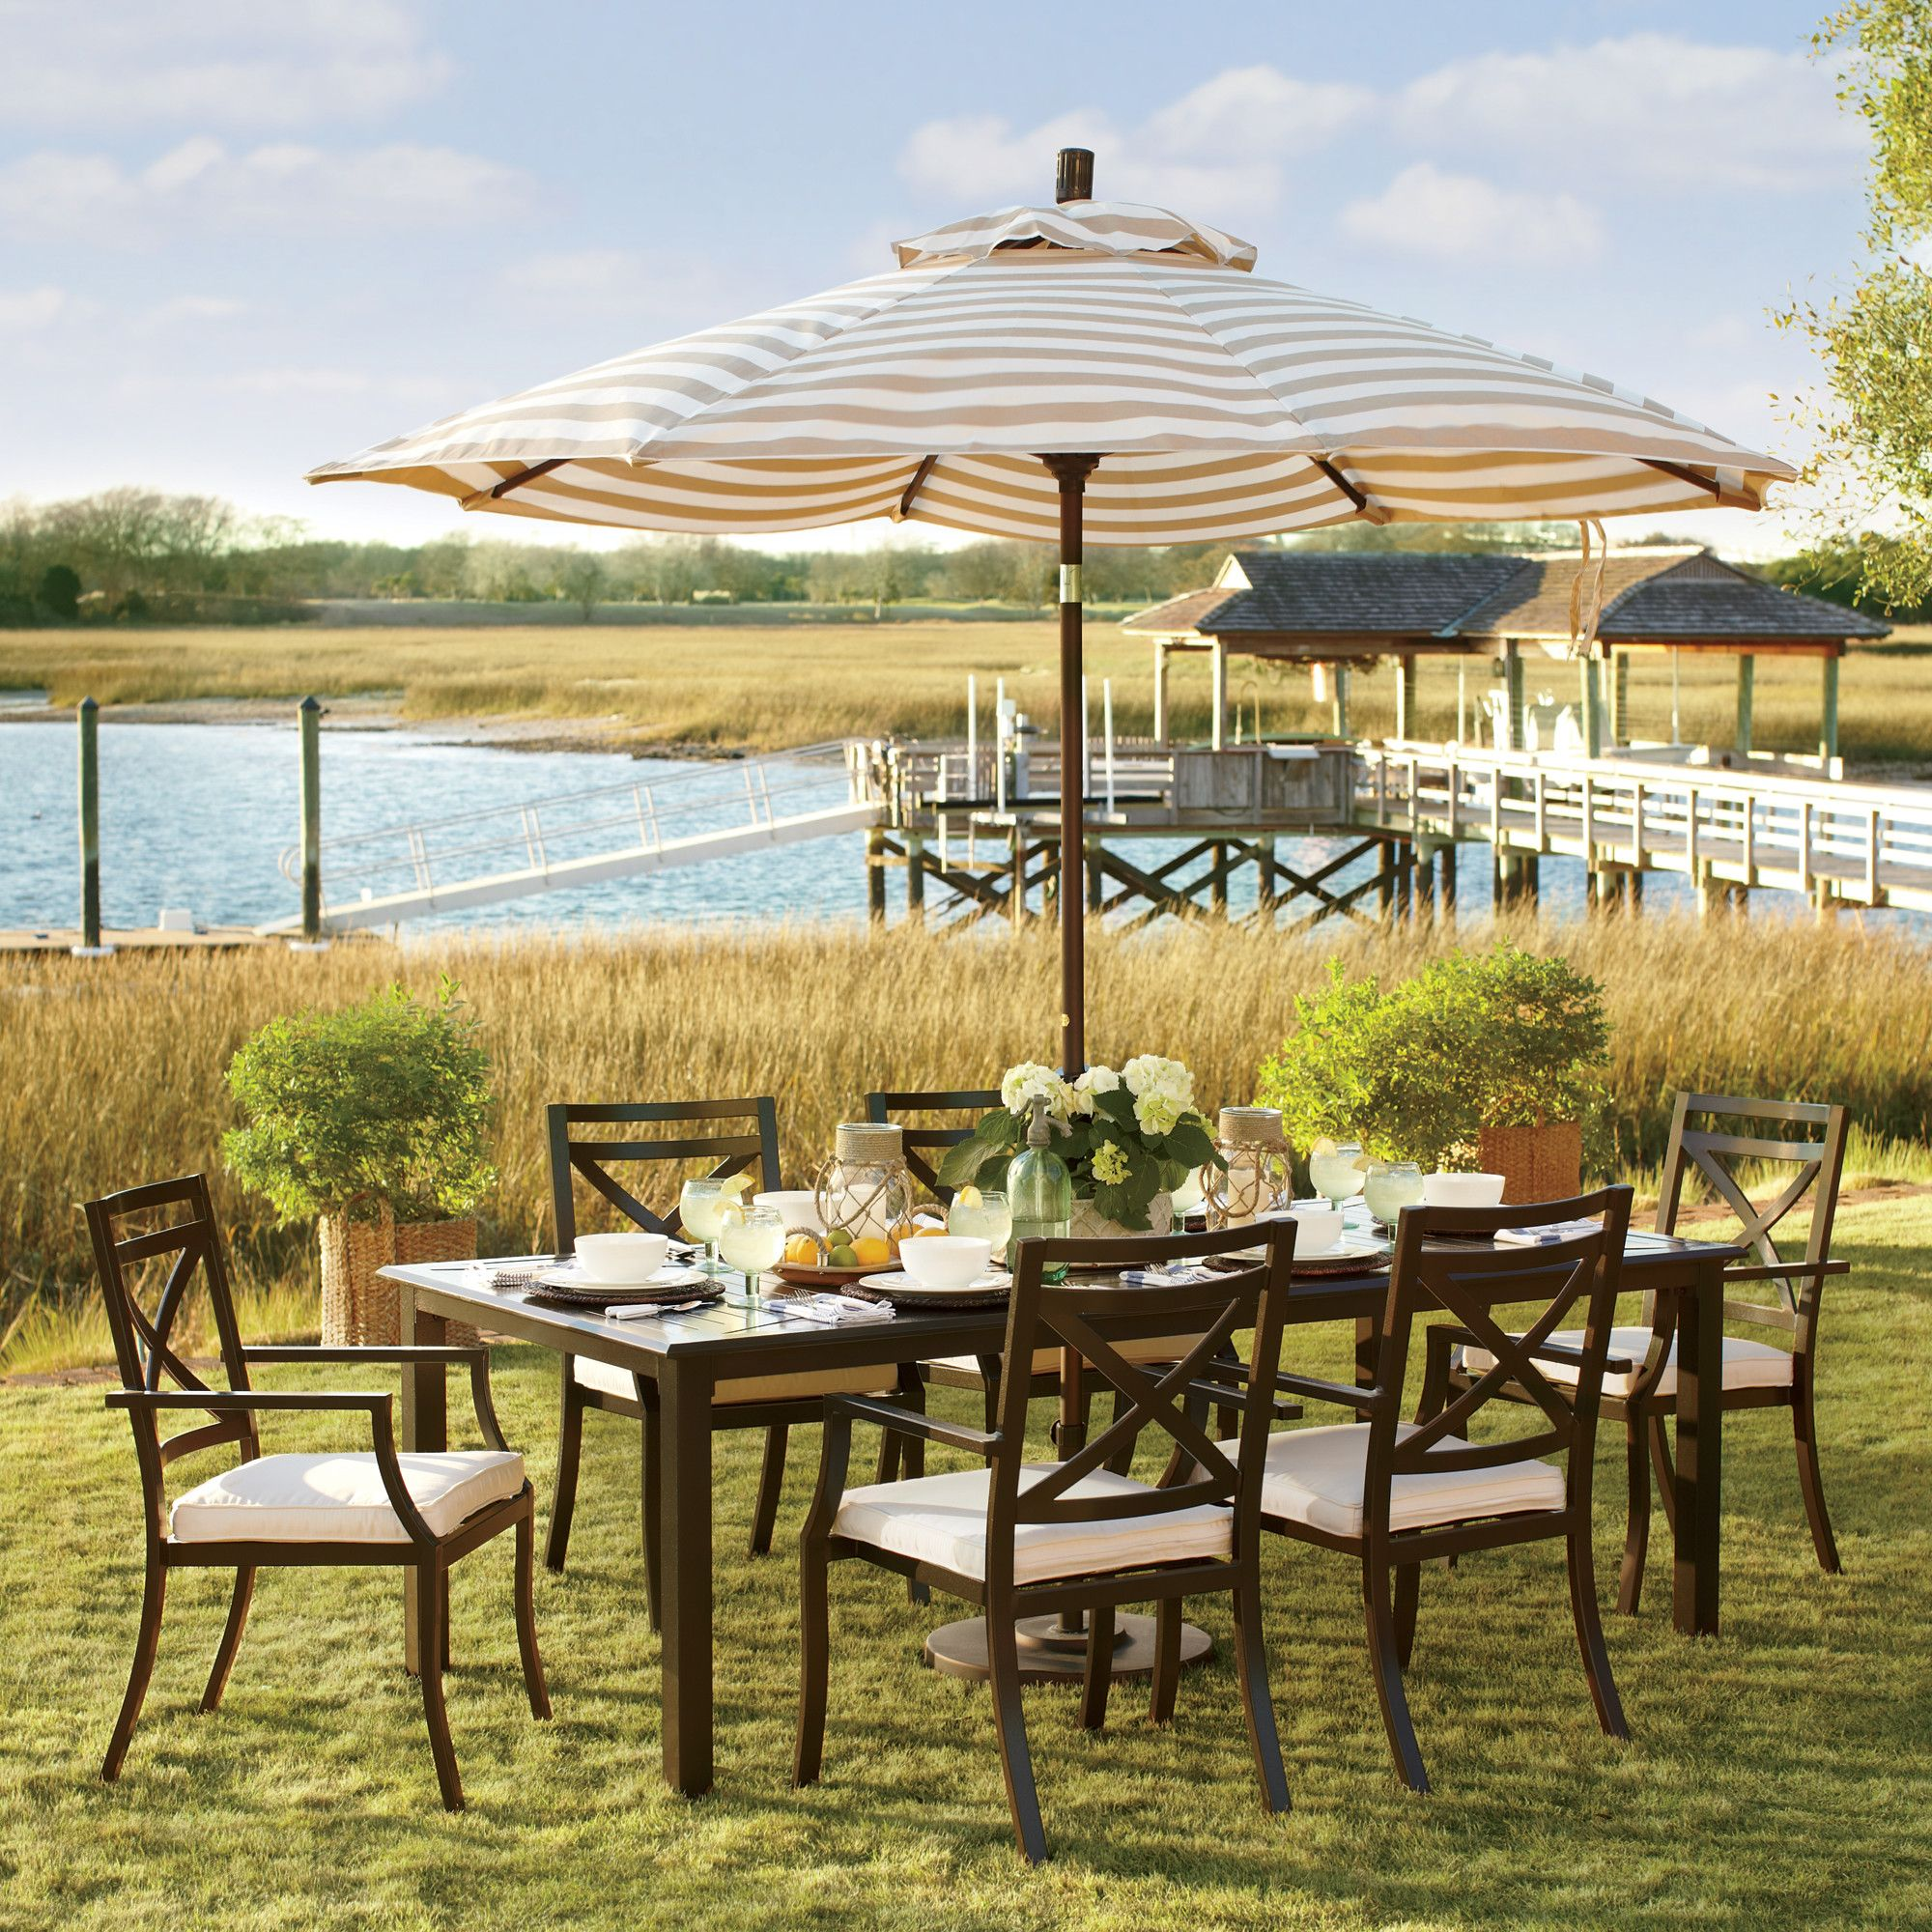 Endicott Rectangular Dining Table Outdoor Decor Patio Umbrella